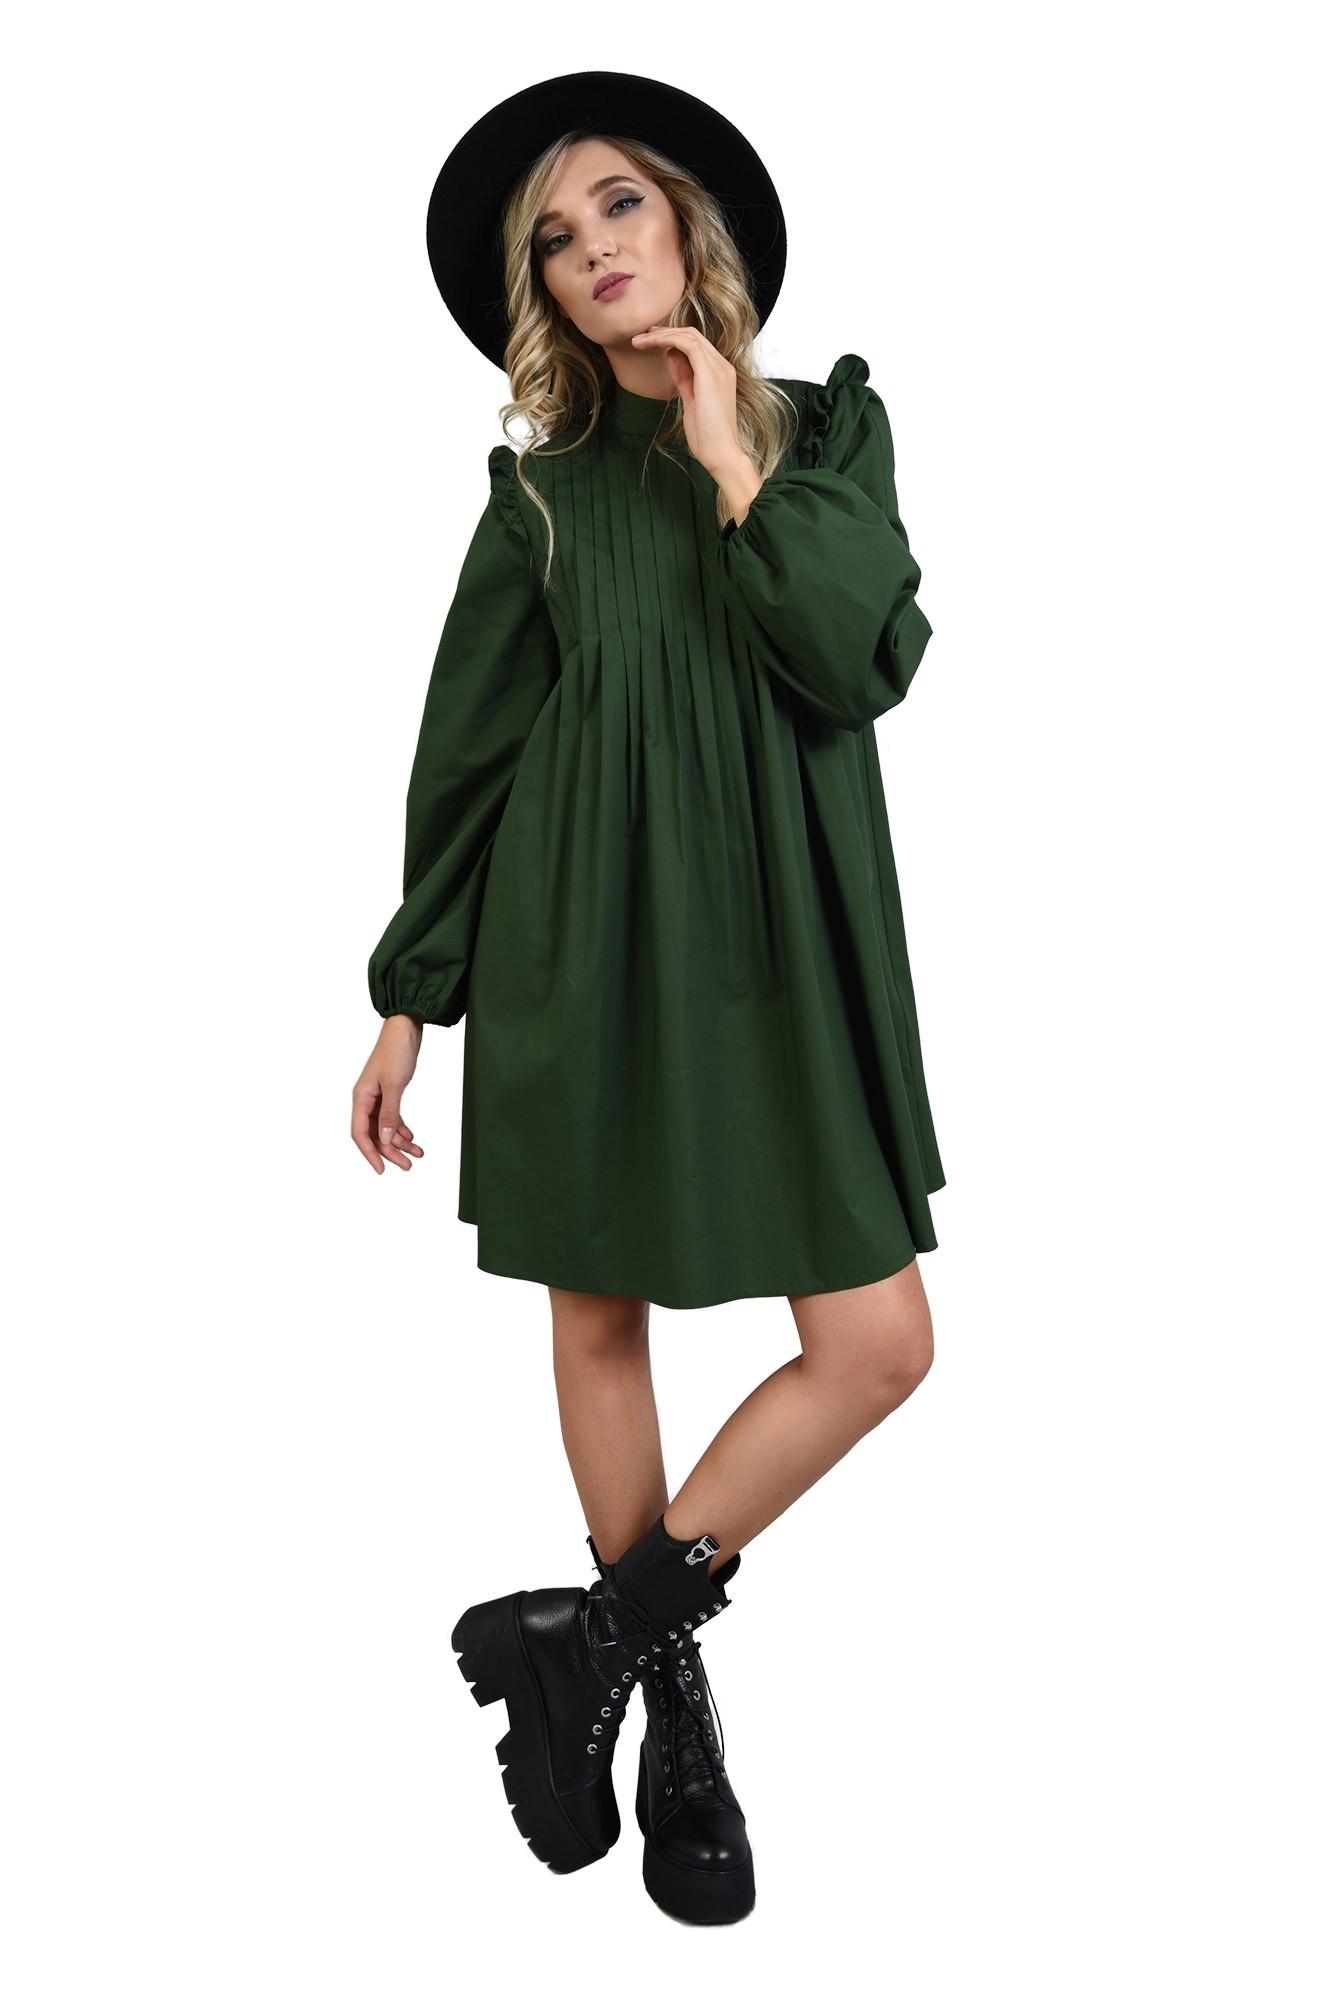 3 - 360 - rochie verde, din bumbac, cu pliuri decorative, maneci bufante